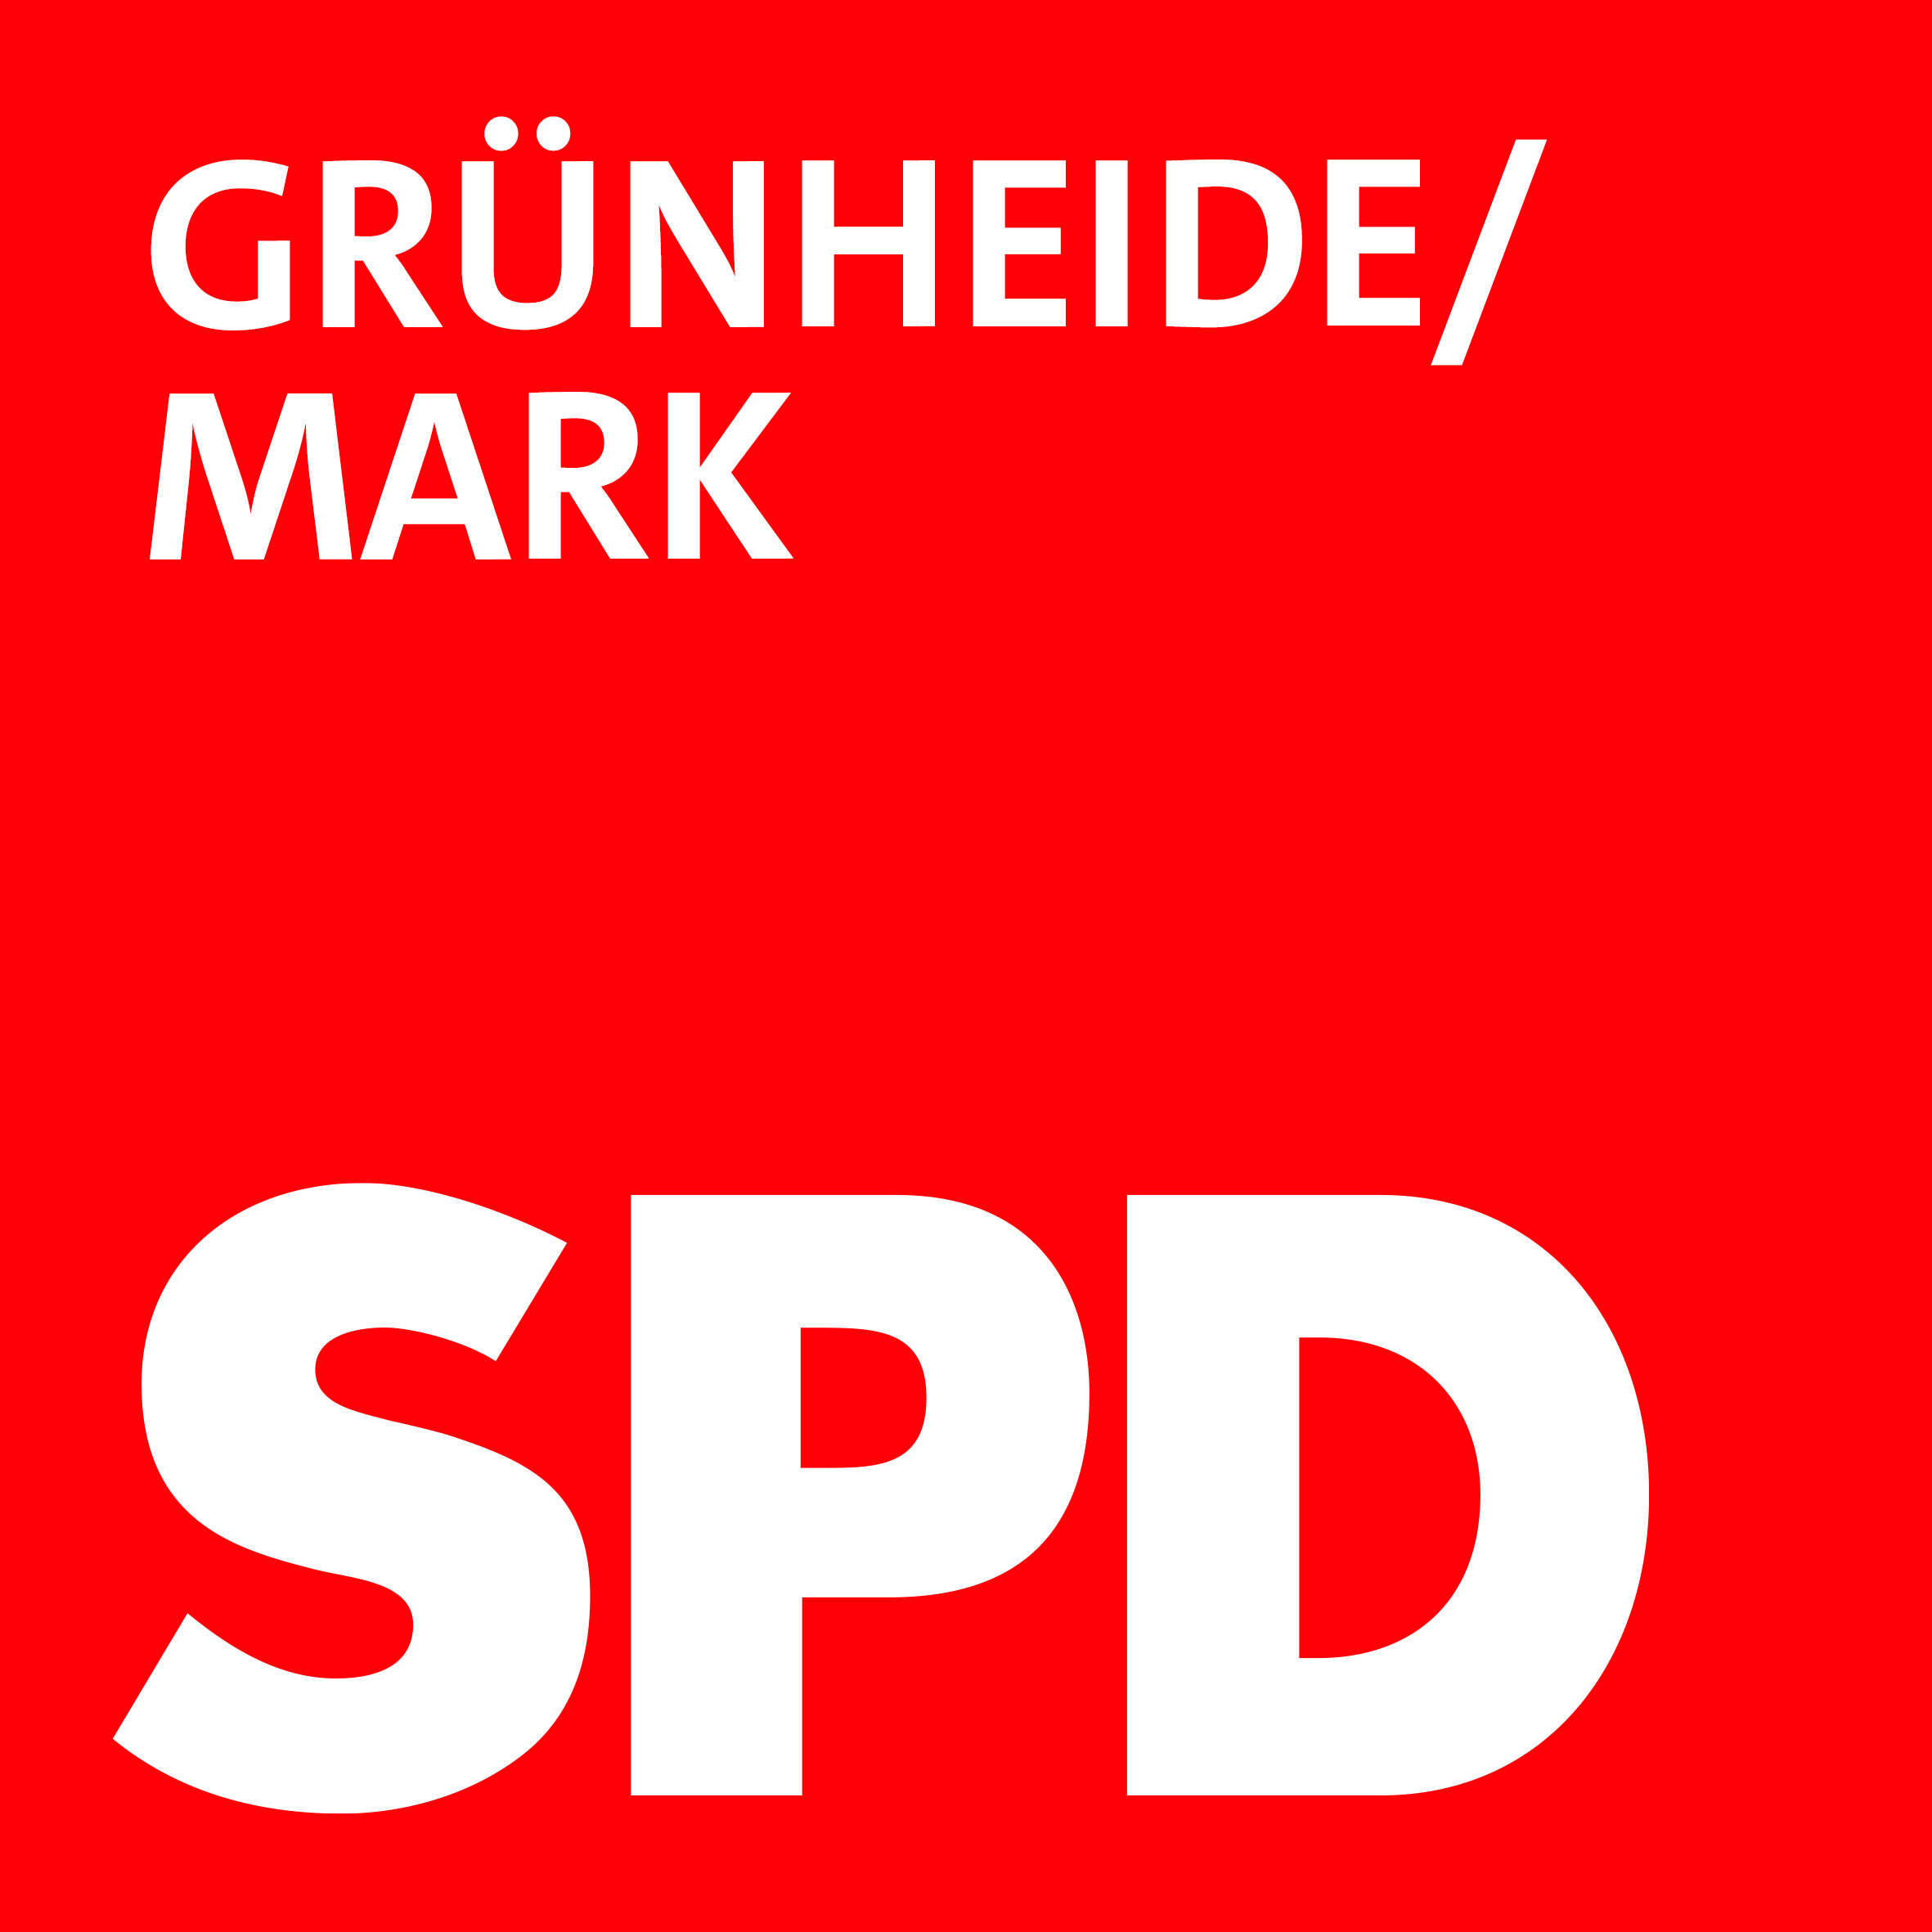 SPD Grünheide/Mark